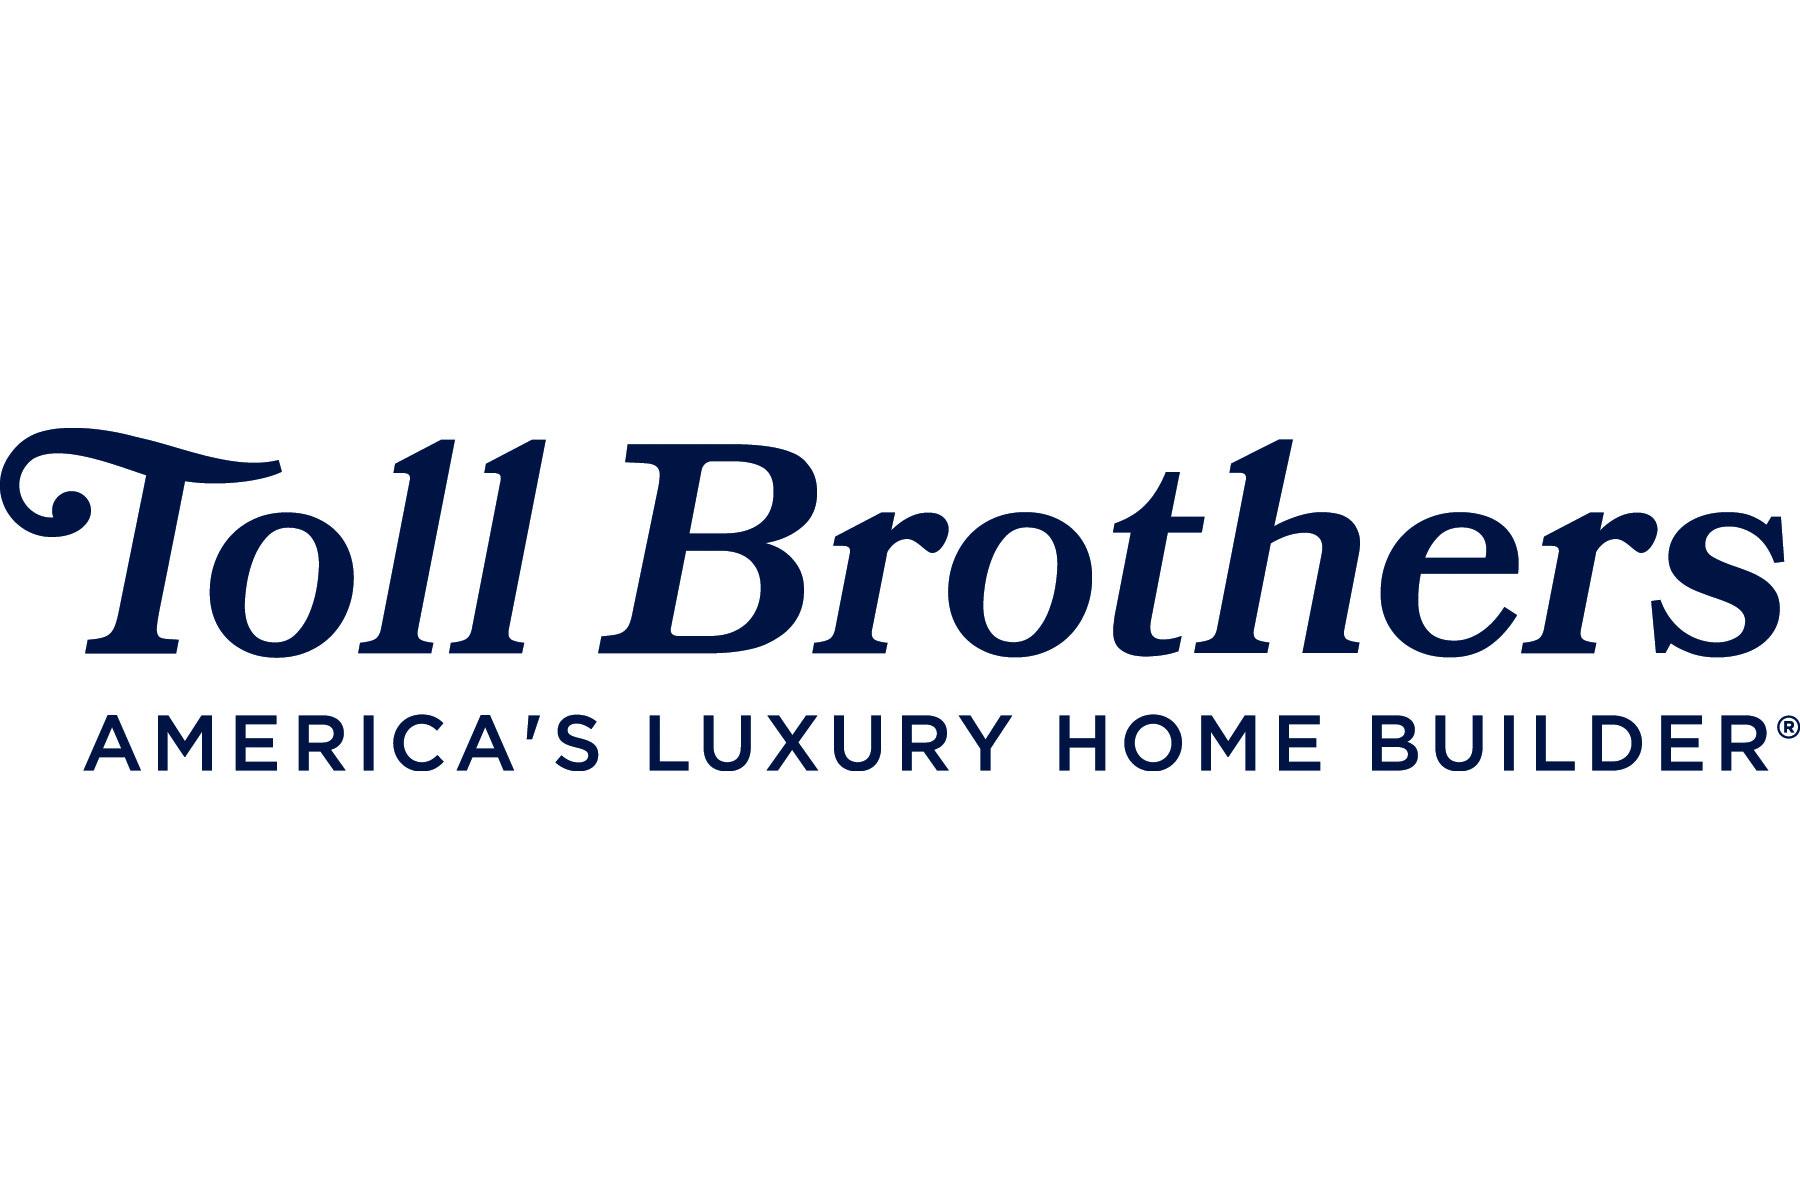 tollbrothers-alhb-bluergb.jpg